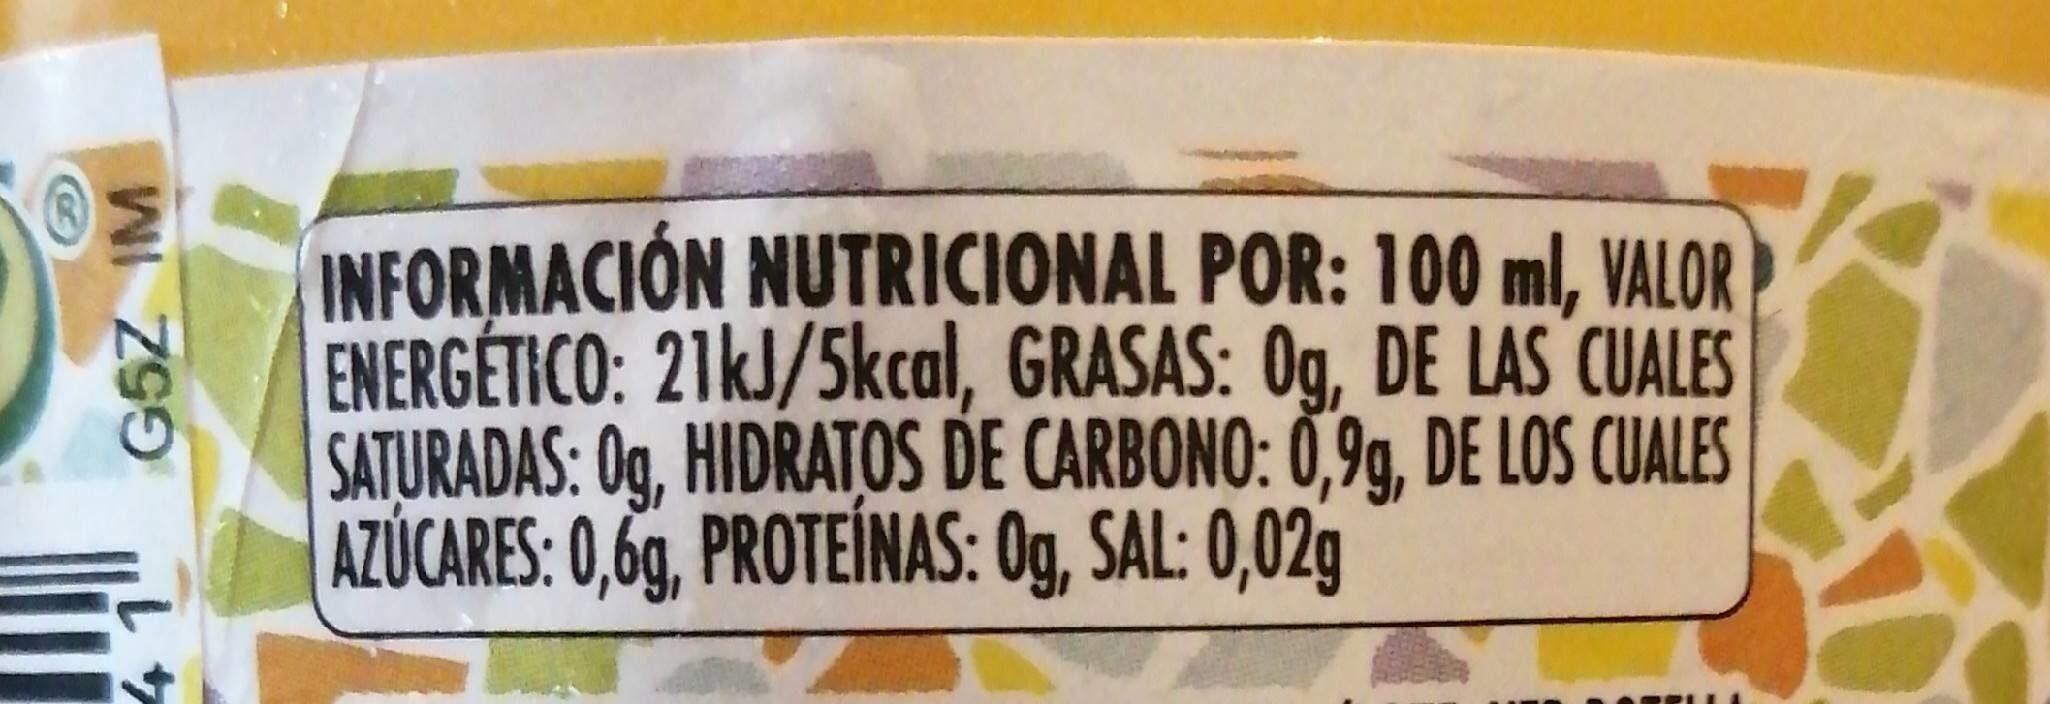 Agua mineral natural con gas sabor naranja - Nutrition facts - es